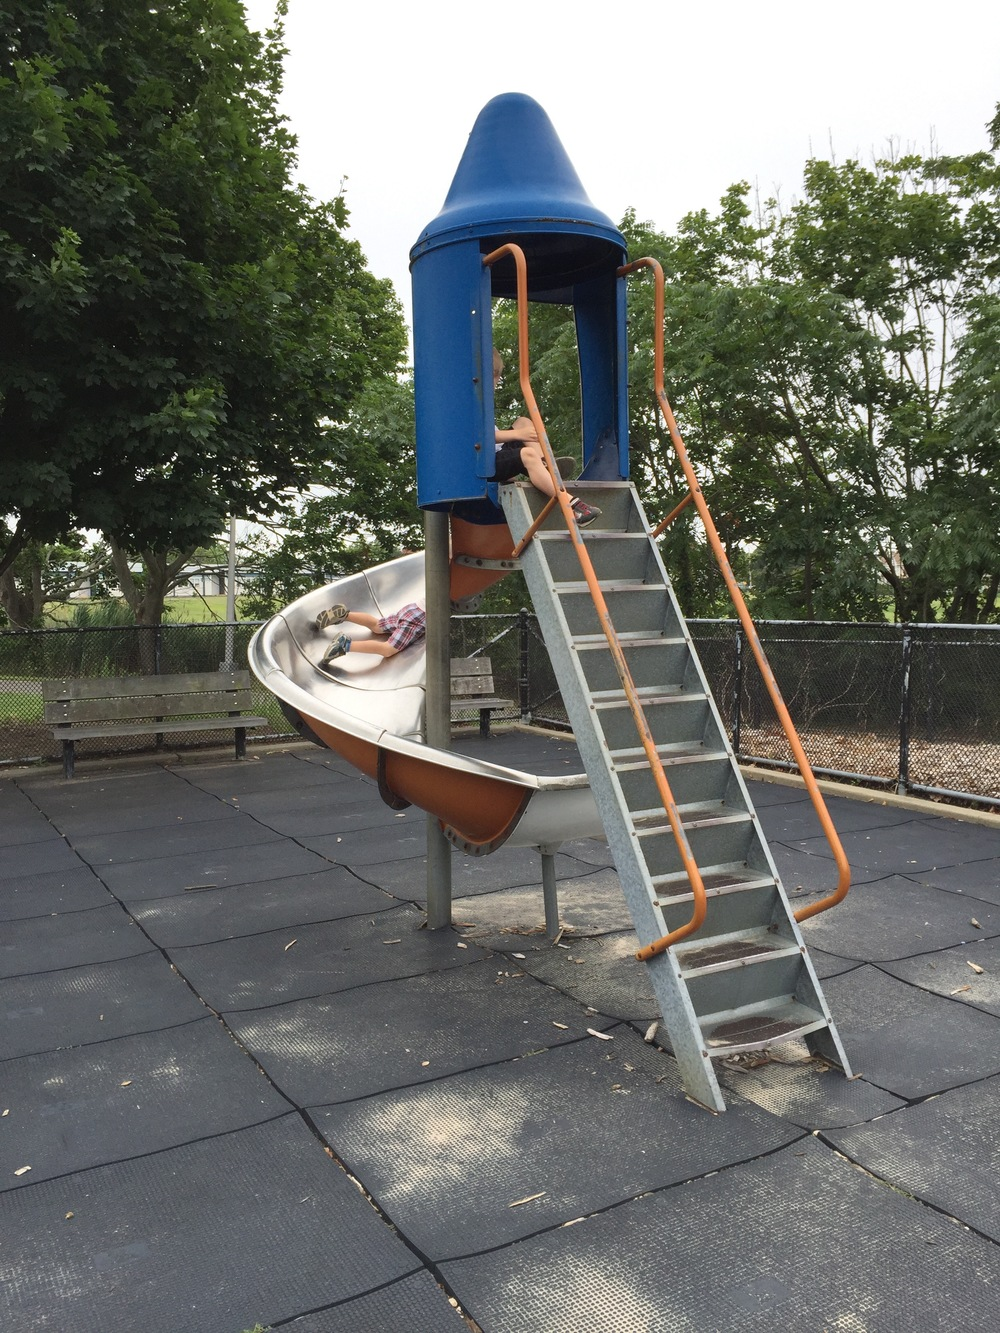 Metal slide at Wantagh Park